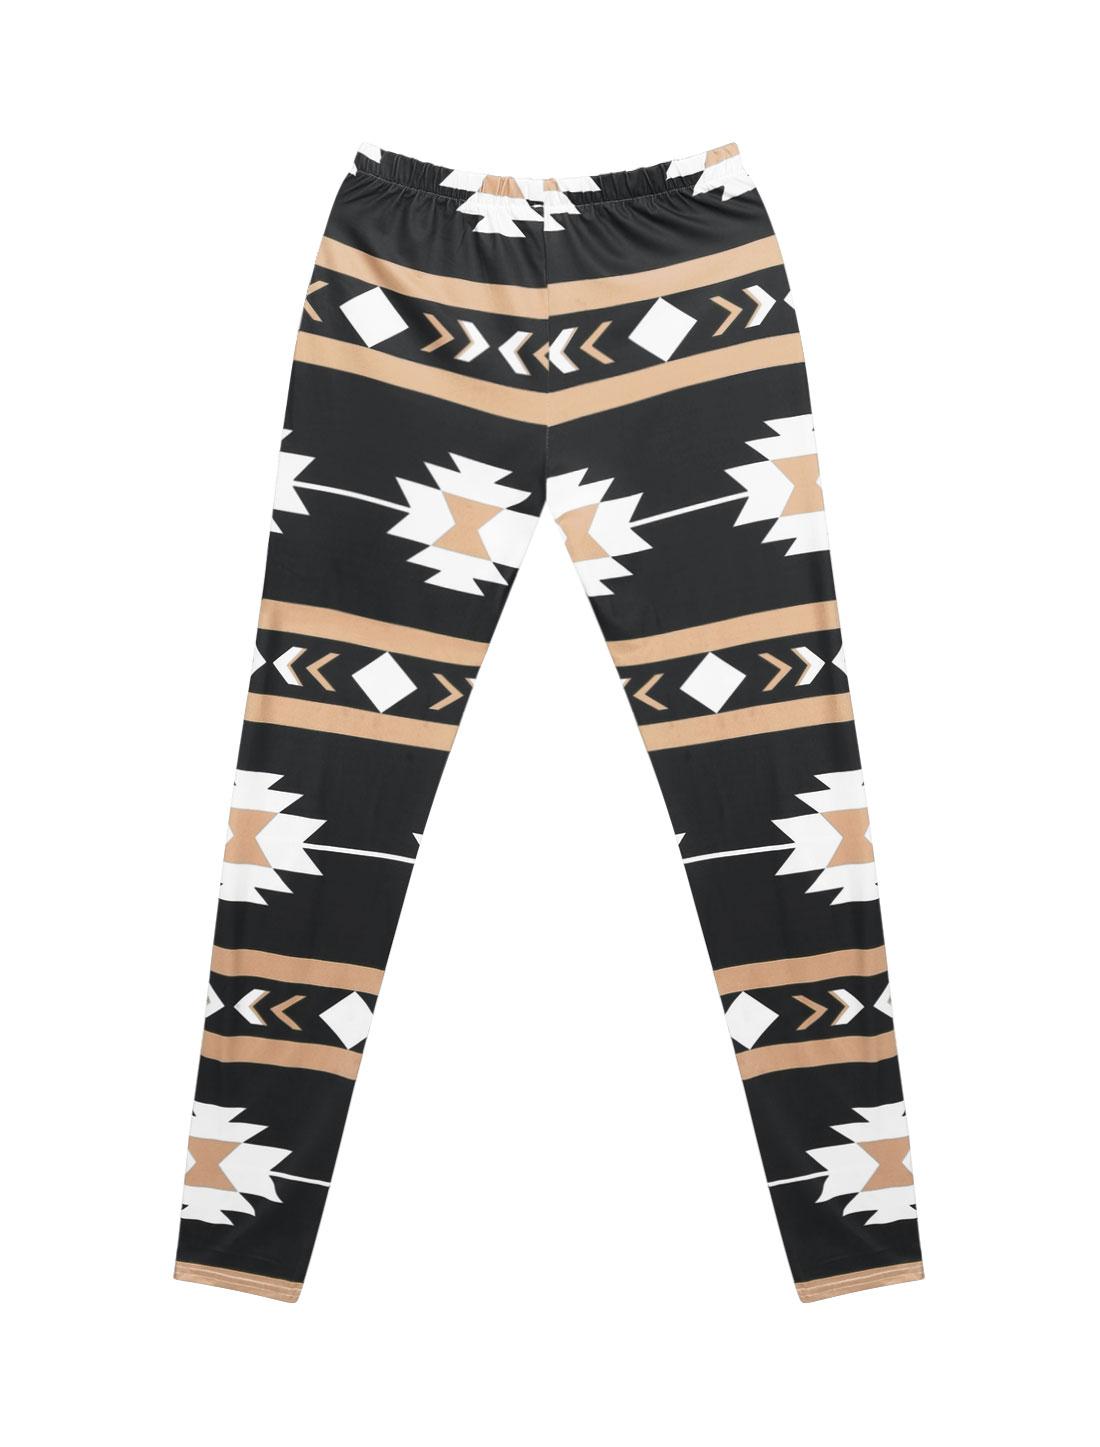 Women High Waist Contrast Color Geometric Prints Skinny Leggings Black M